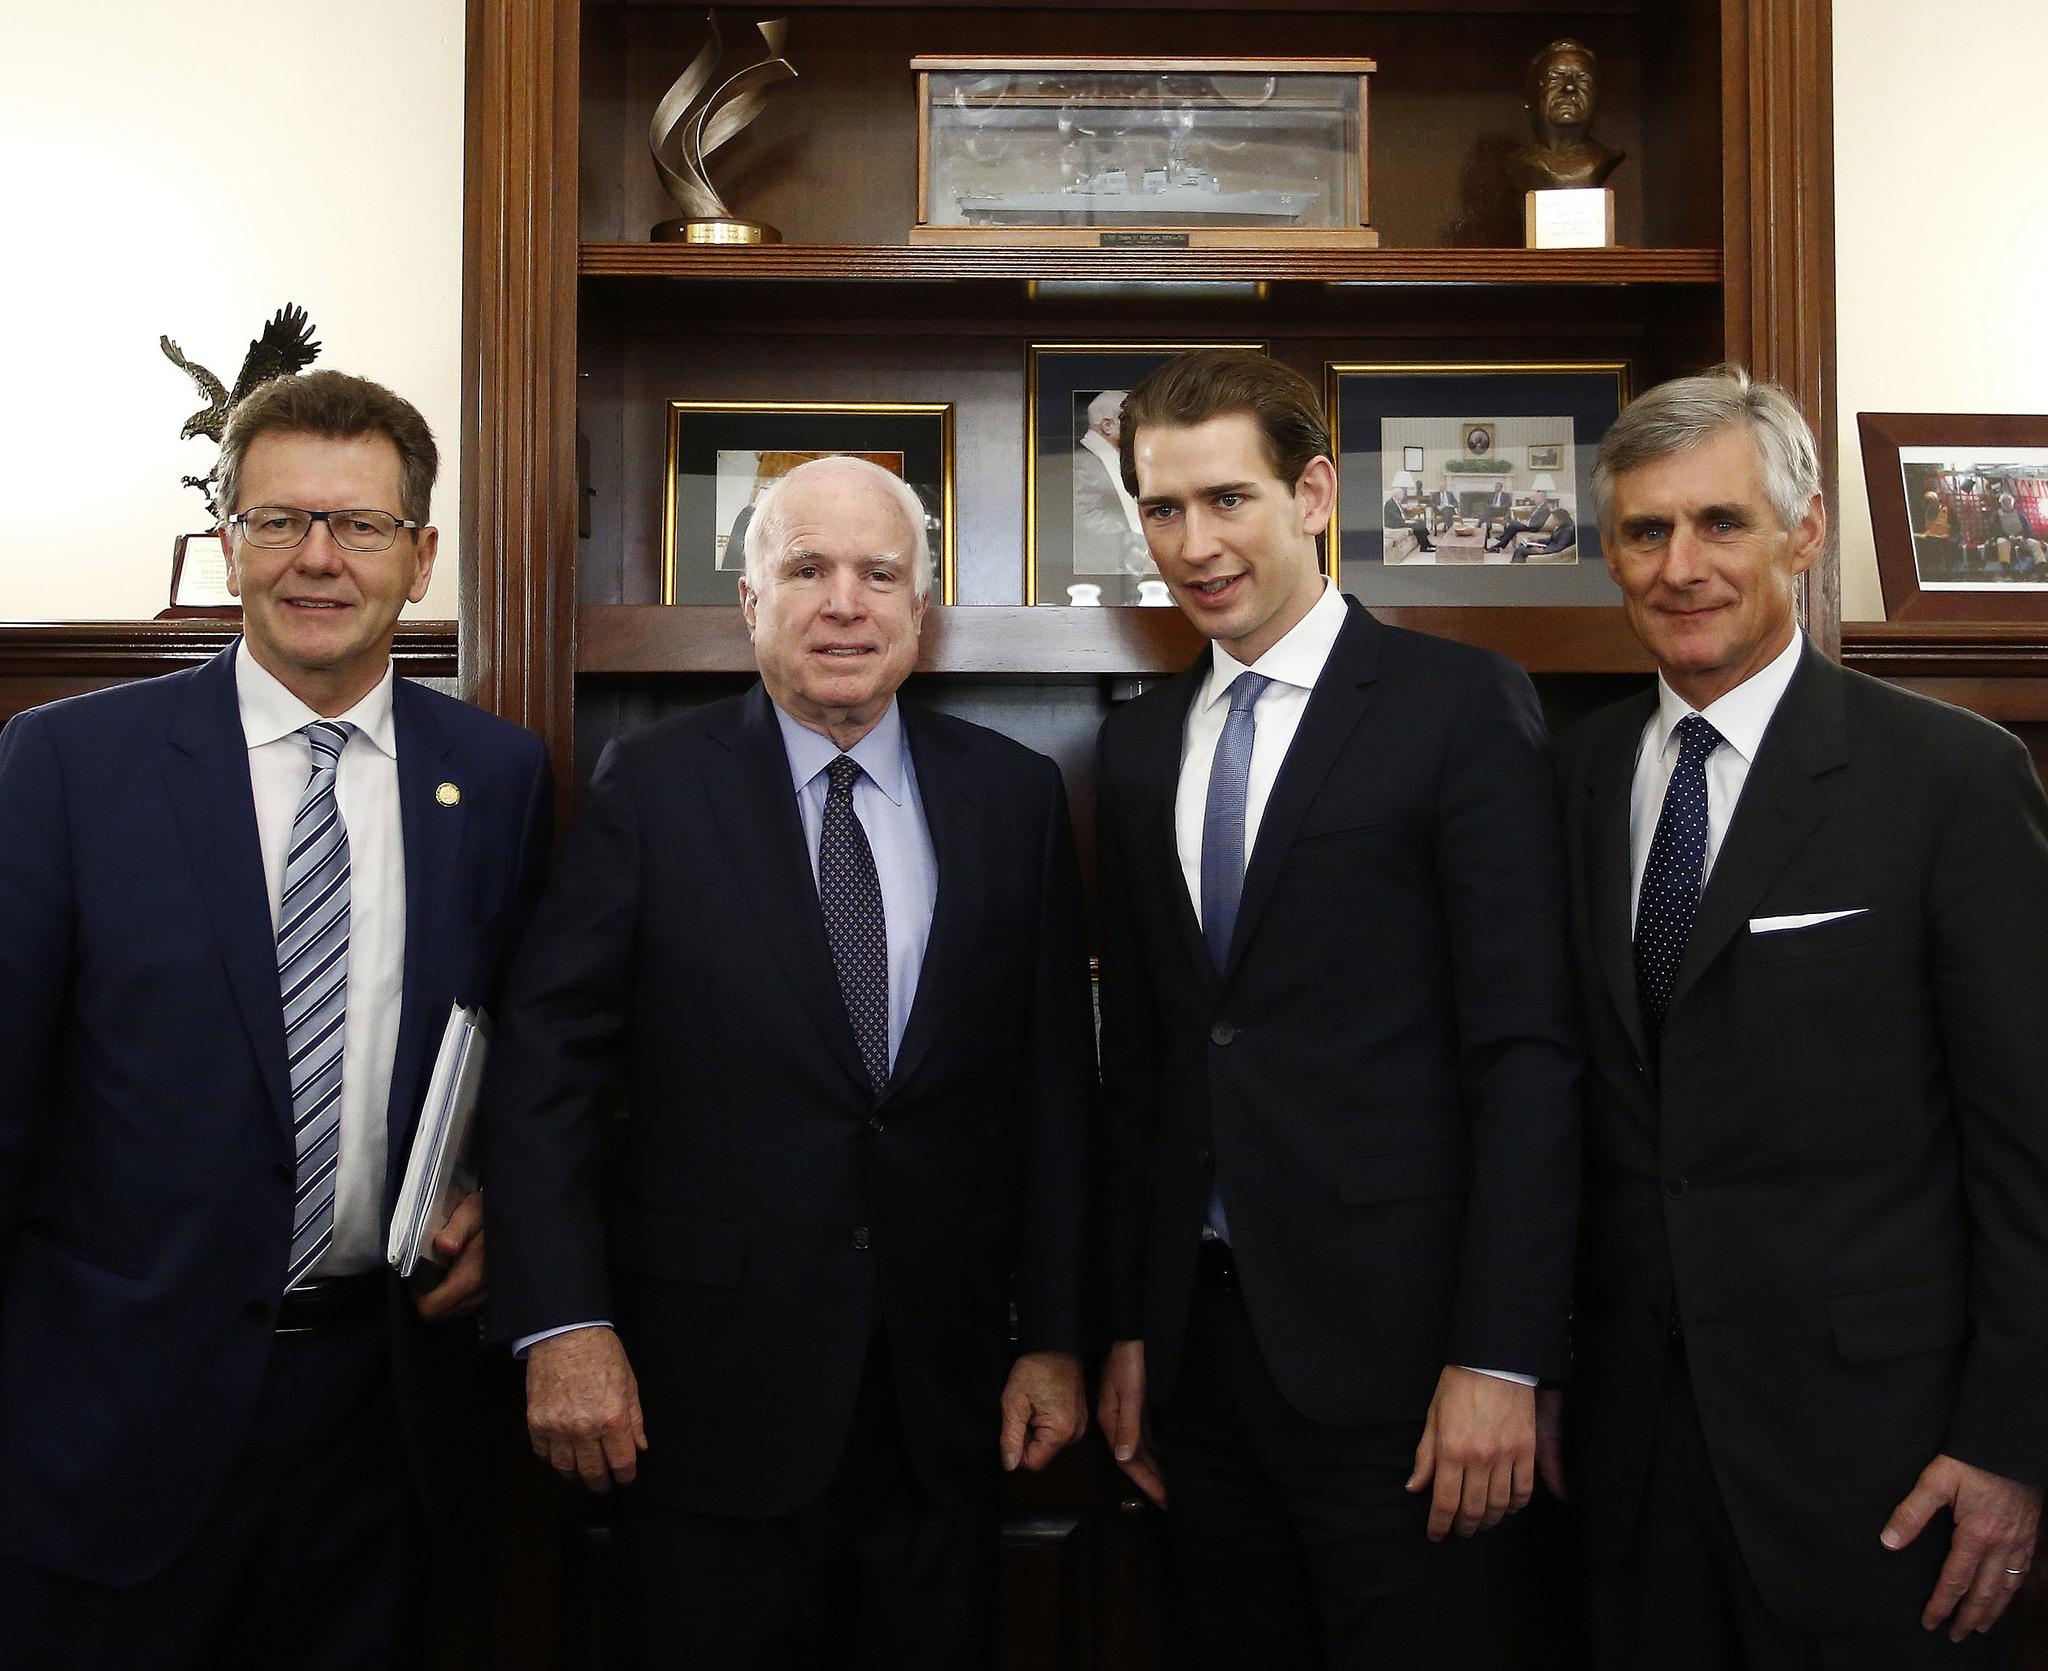 FM Kurz, Senator Mc Cain, SG Linhart & Amb. Waldner. Photo: Dragan Tatic